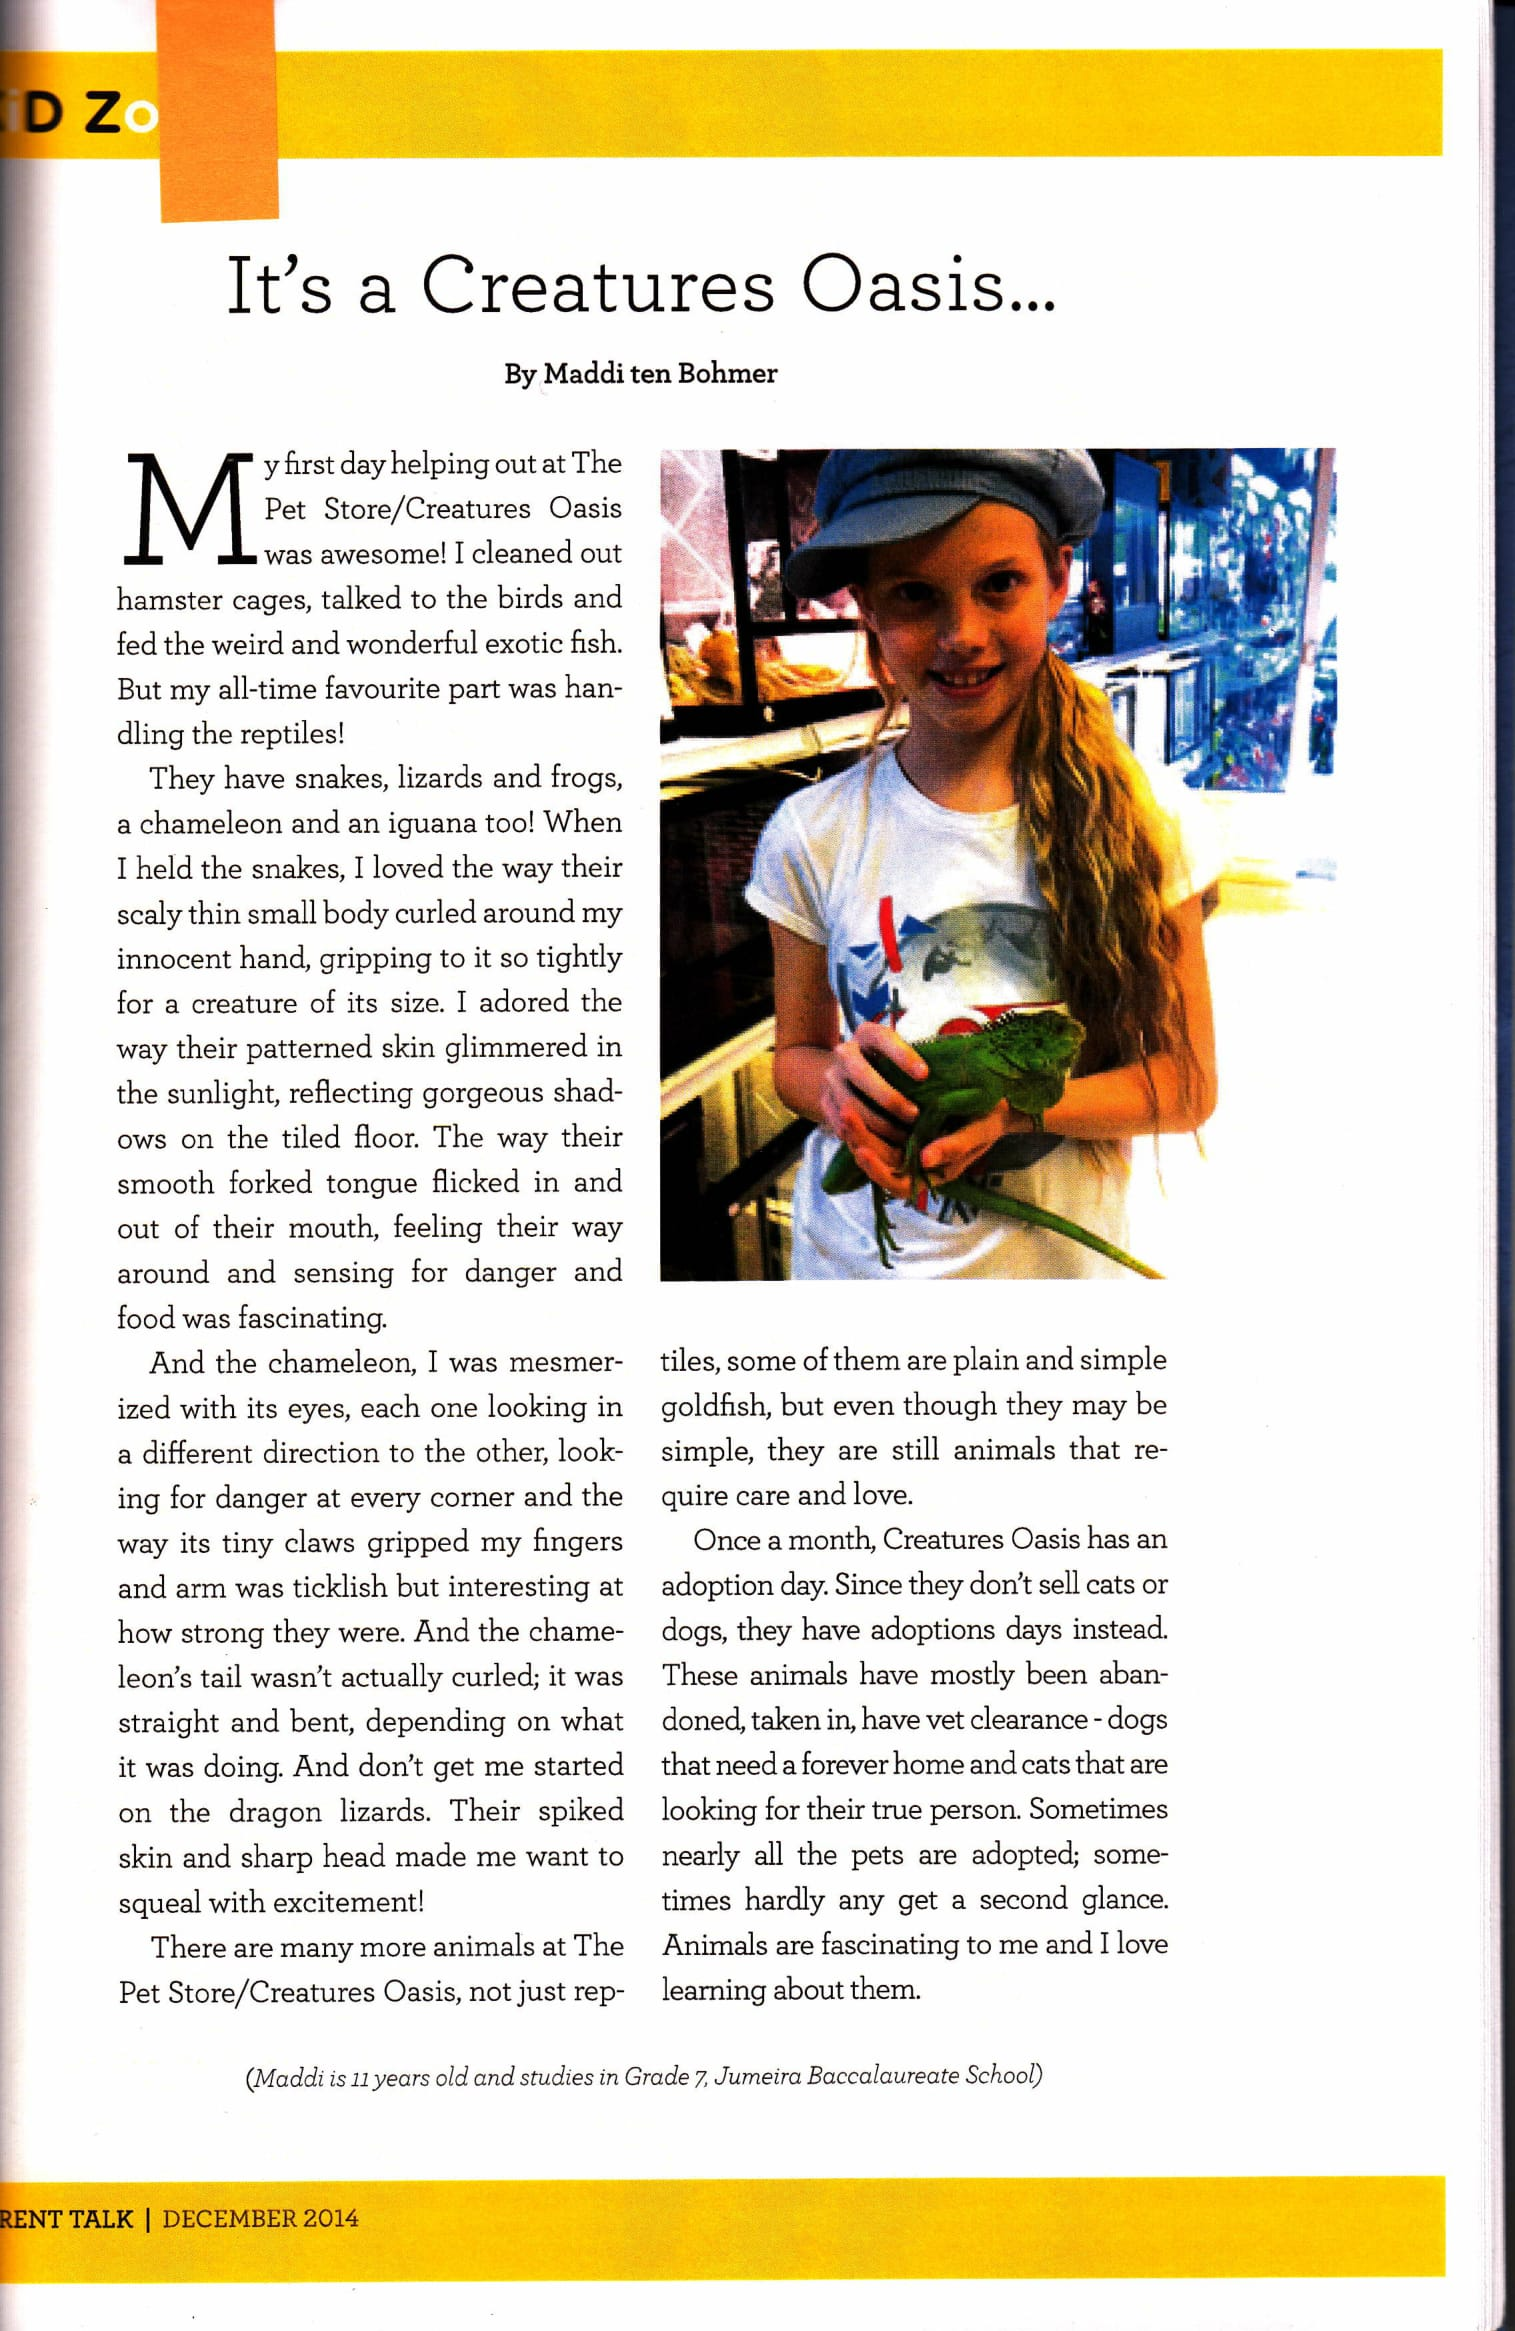 Maddison_Parent Talk Article